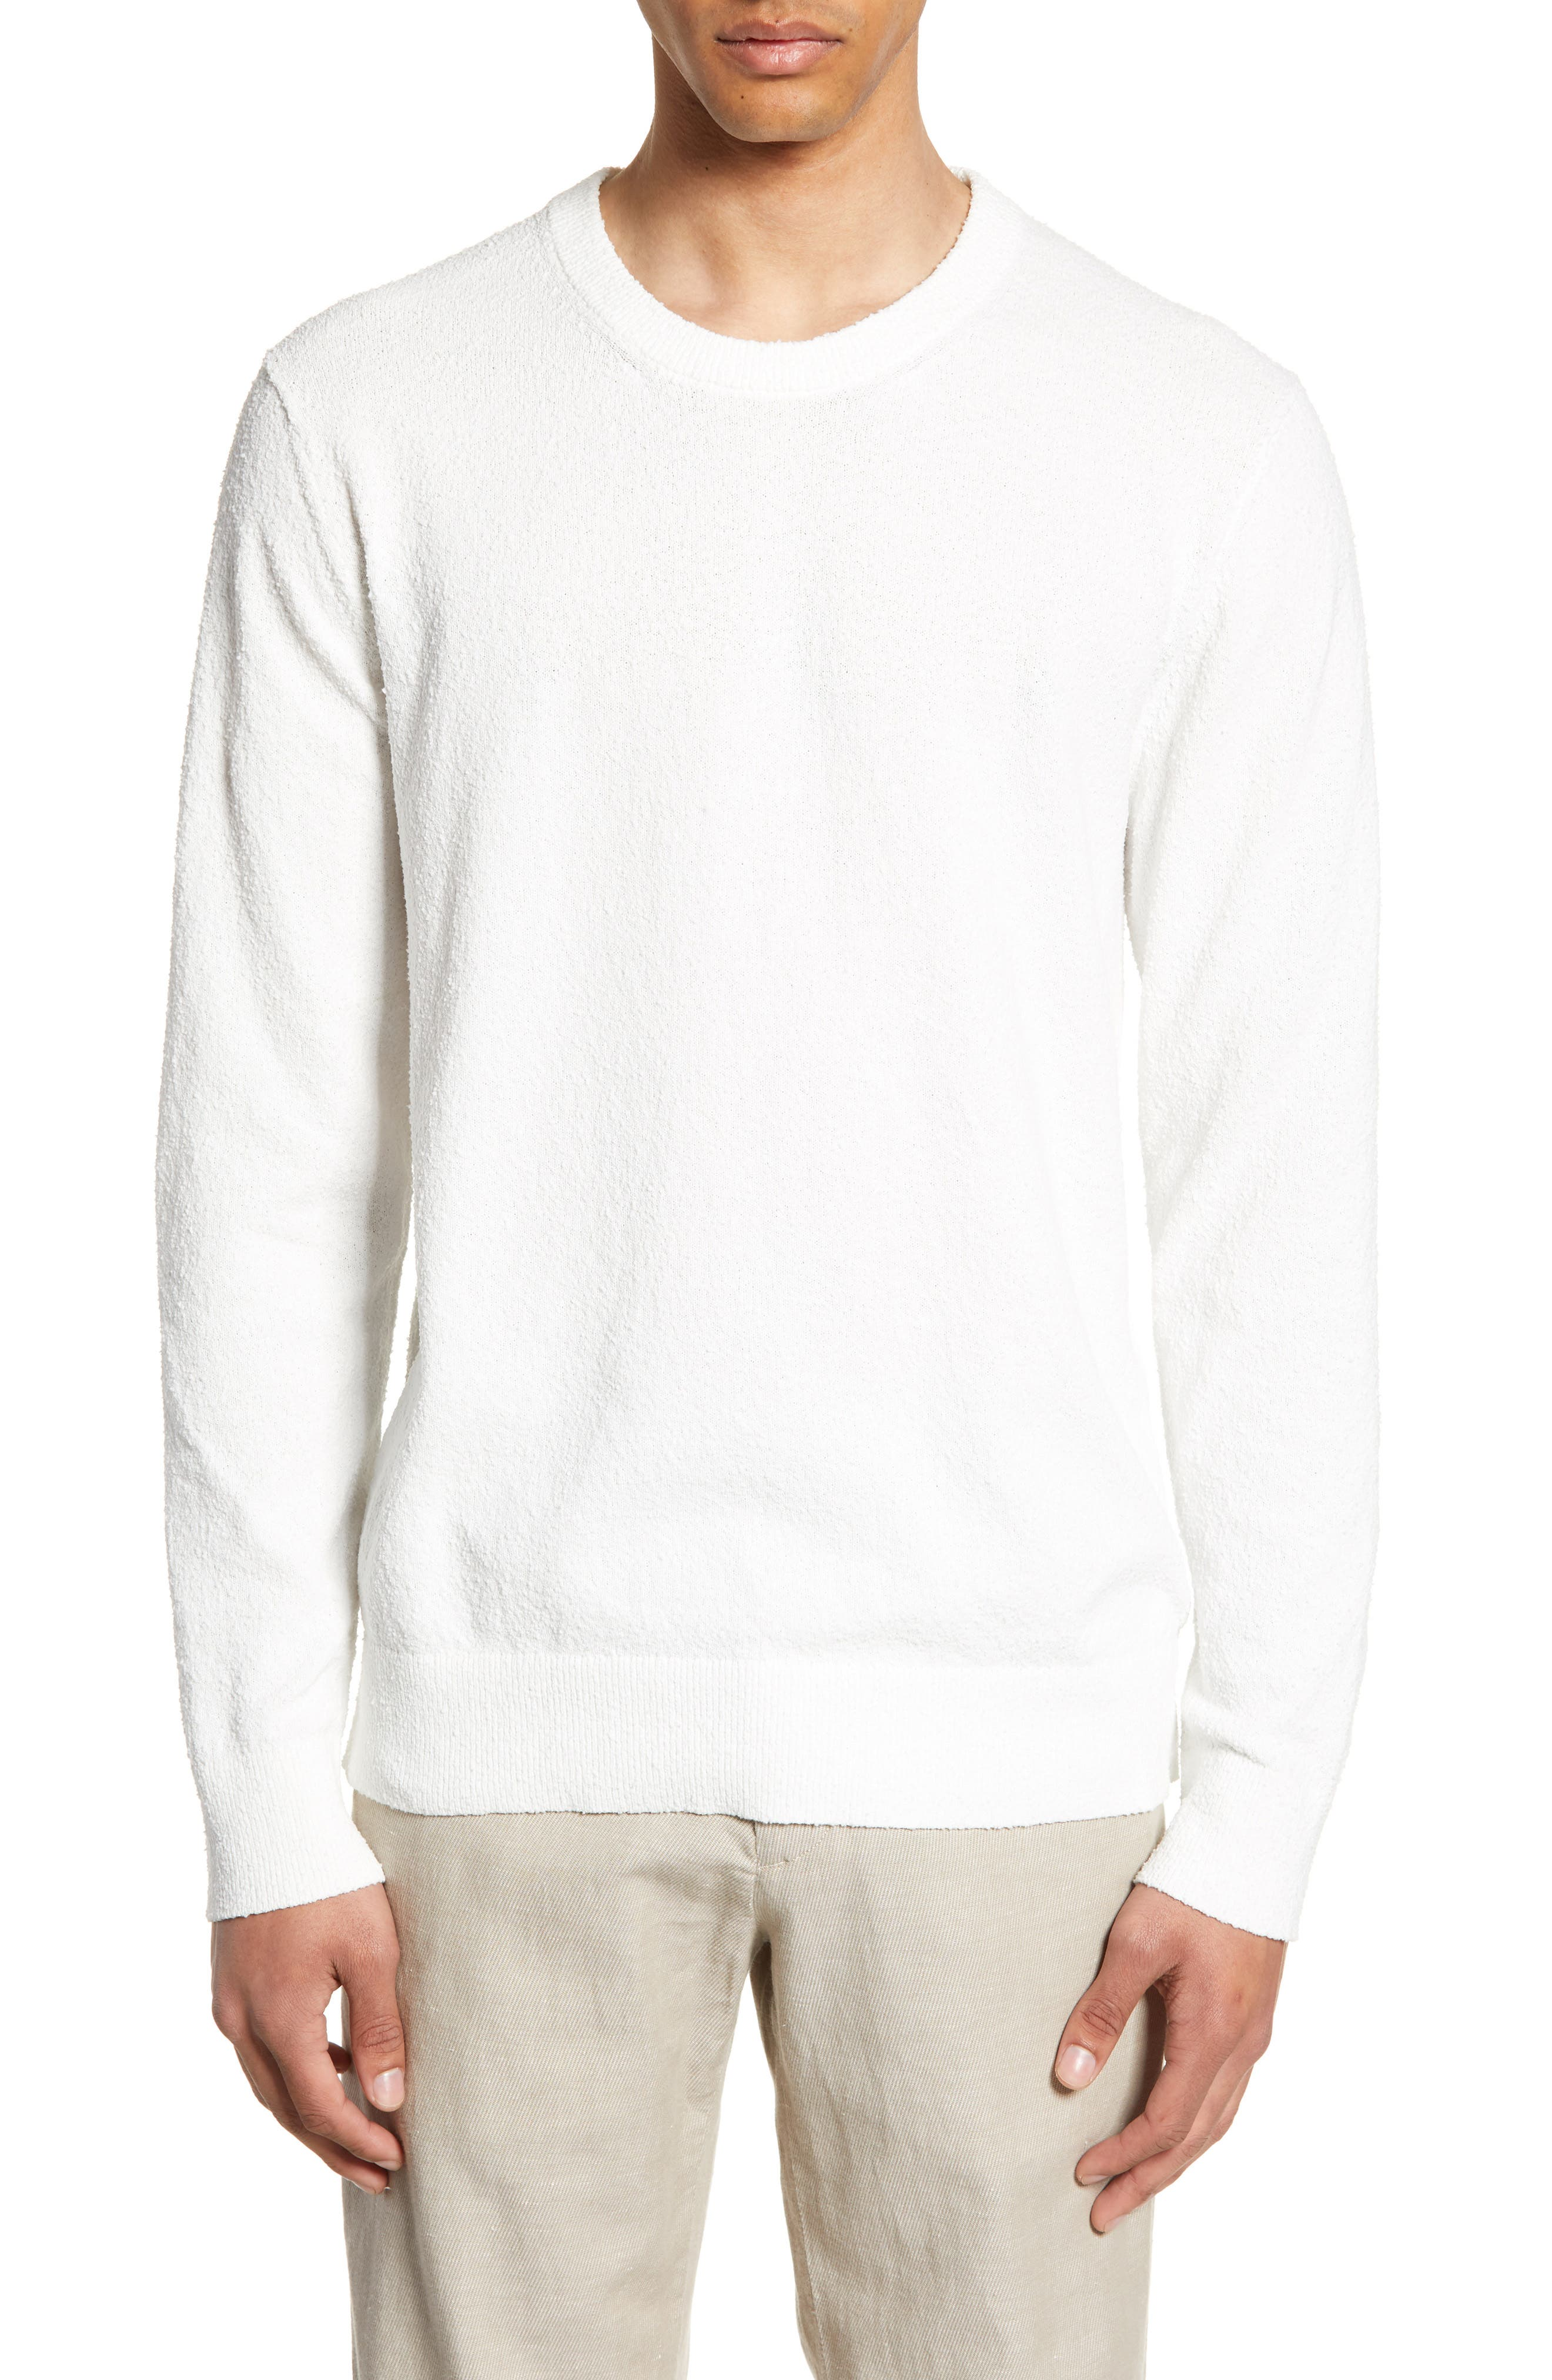 Club Monaco Slim Fit Boucle Sweater, Beige